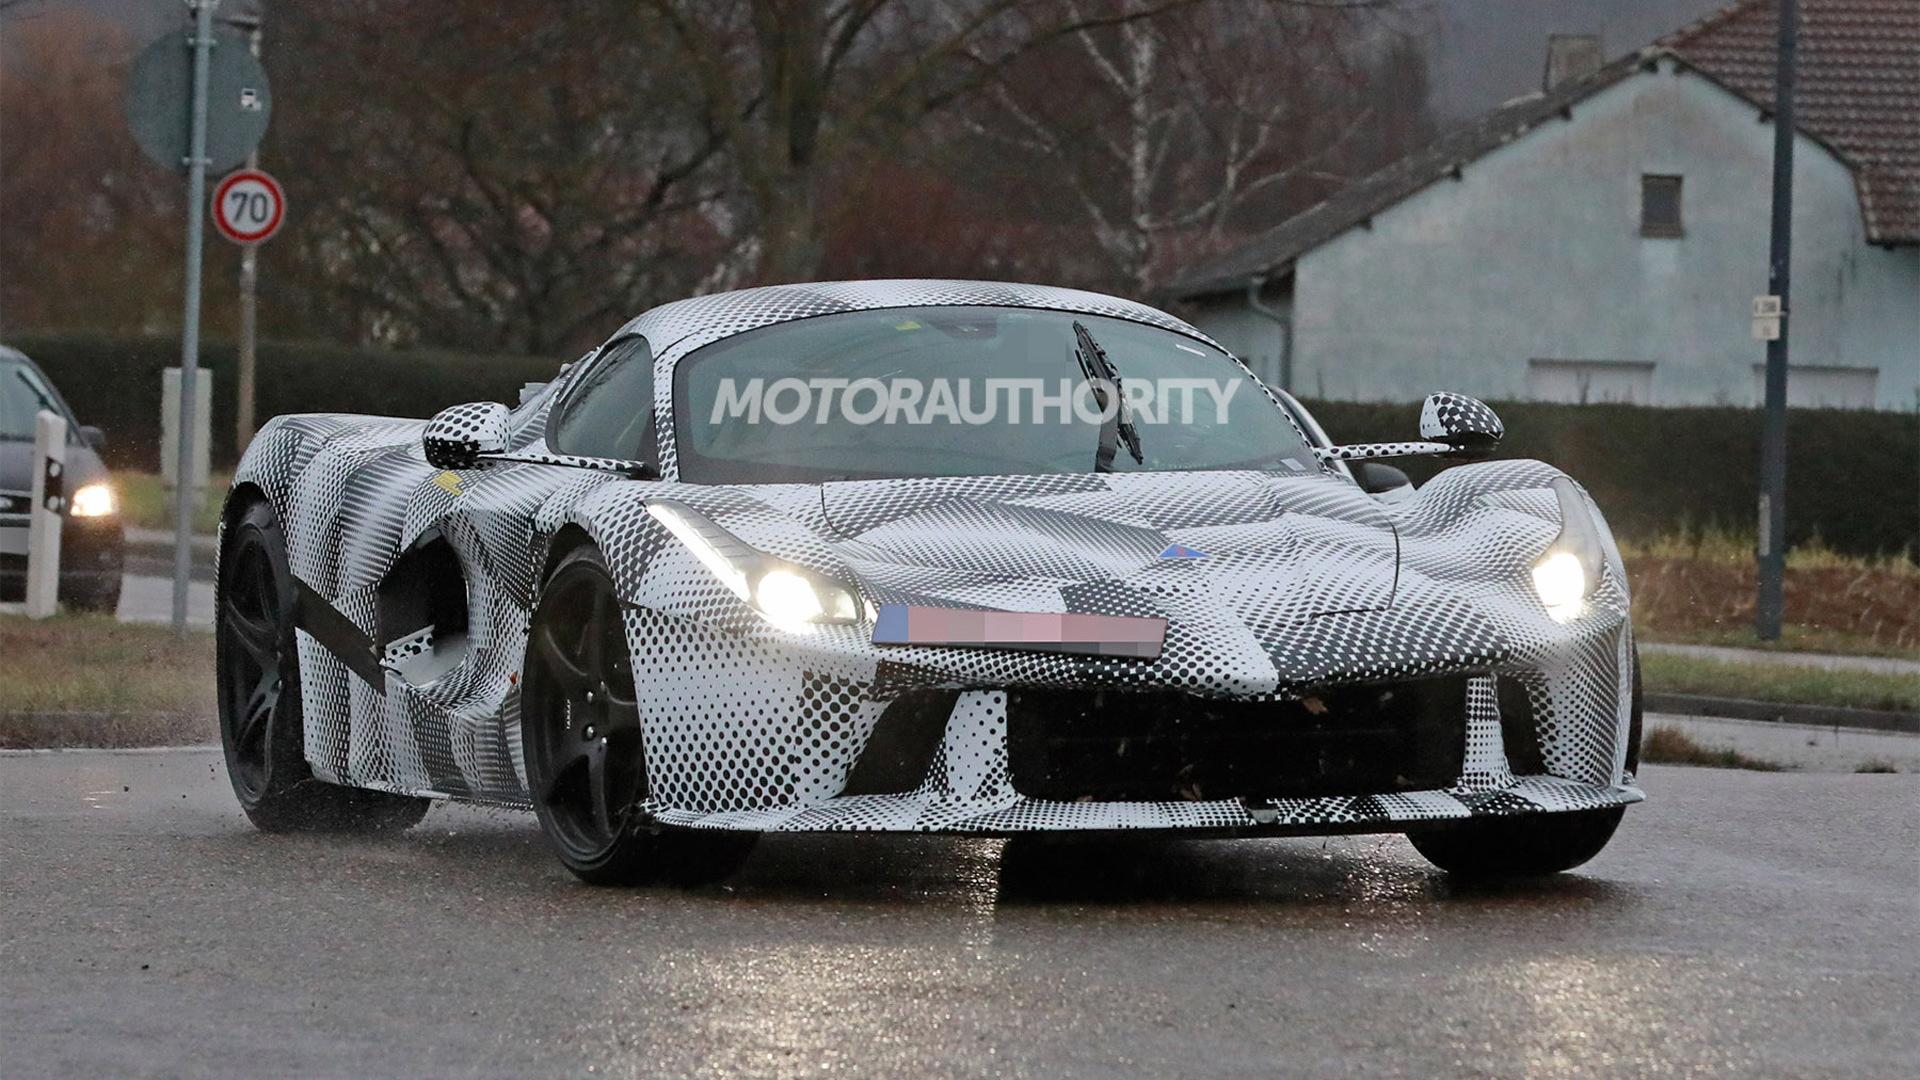 Ferrari Special Series test mule spy shots - Photo credit: S. Baldauf/SB-Medien